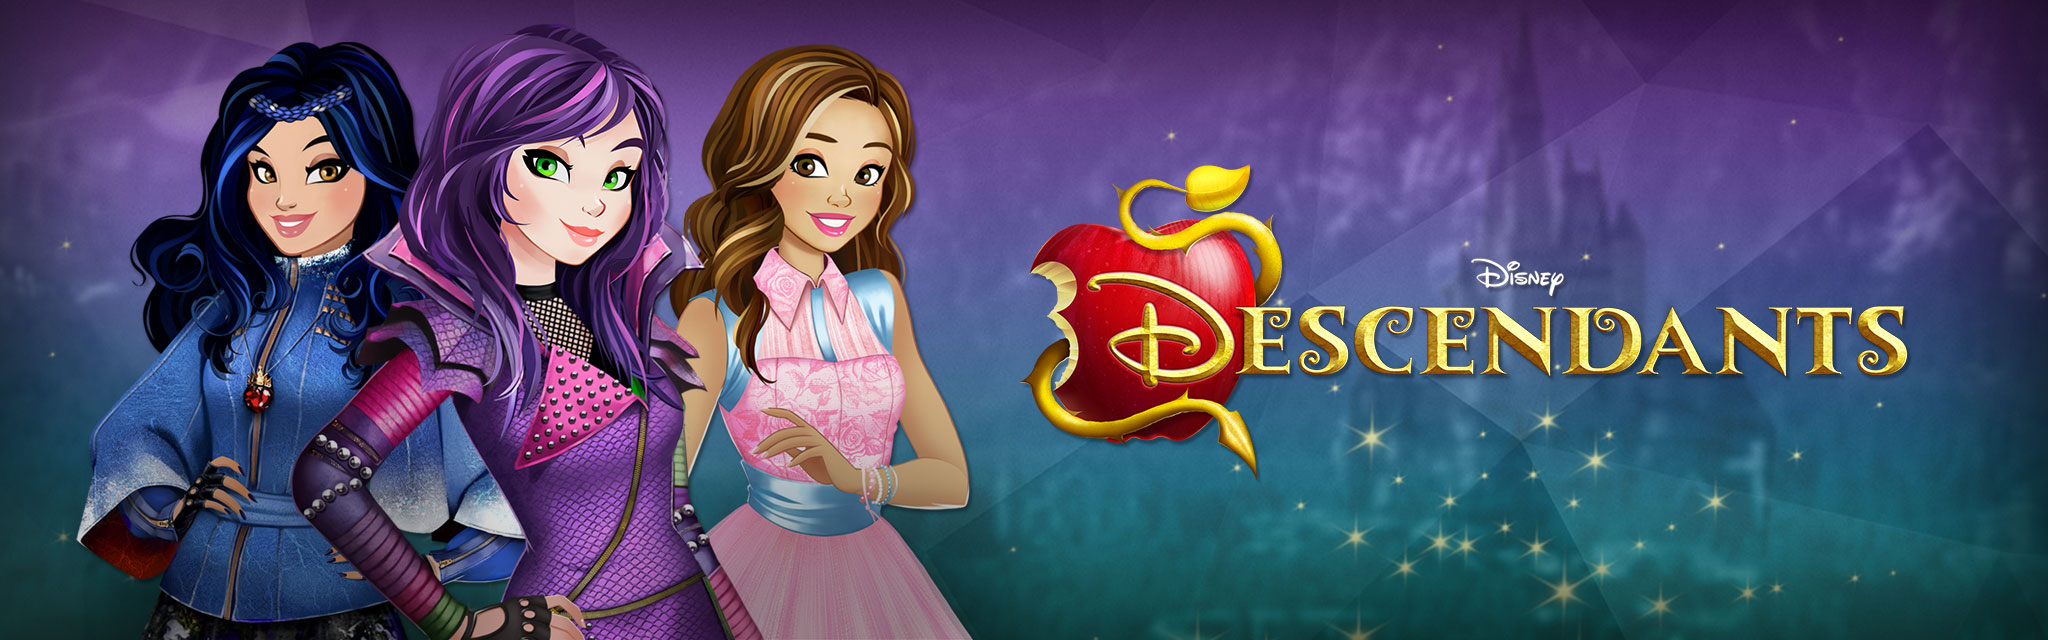 Descendants Games Lol Disney